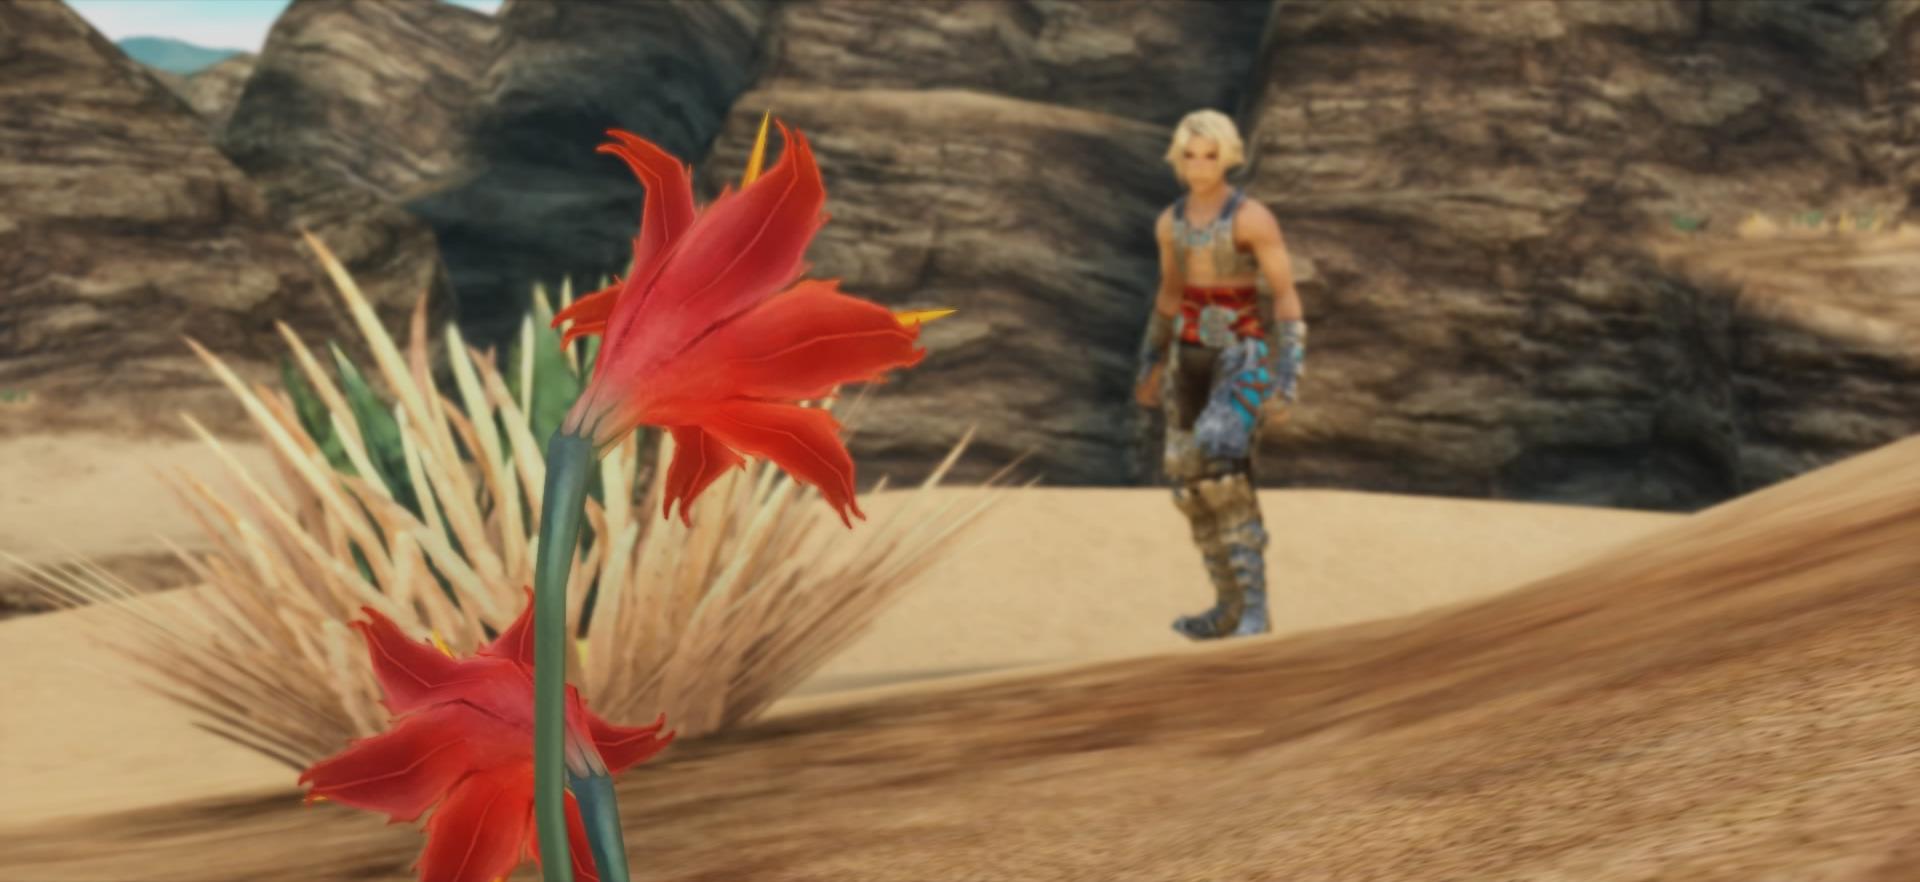 File:Galbana lilies.jpg